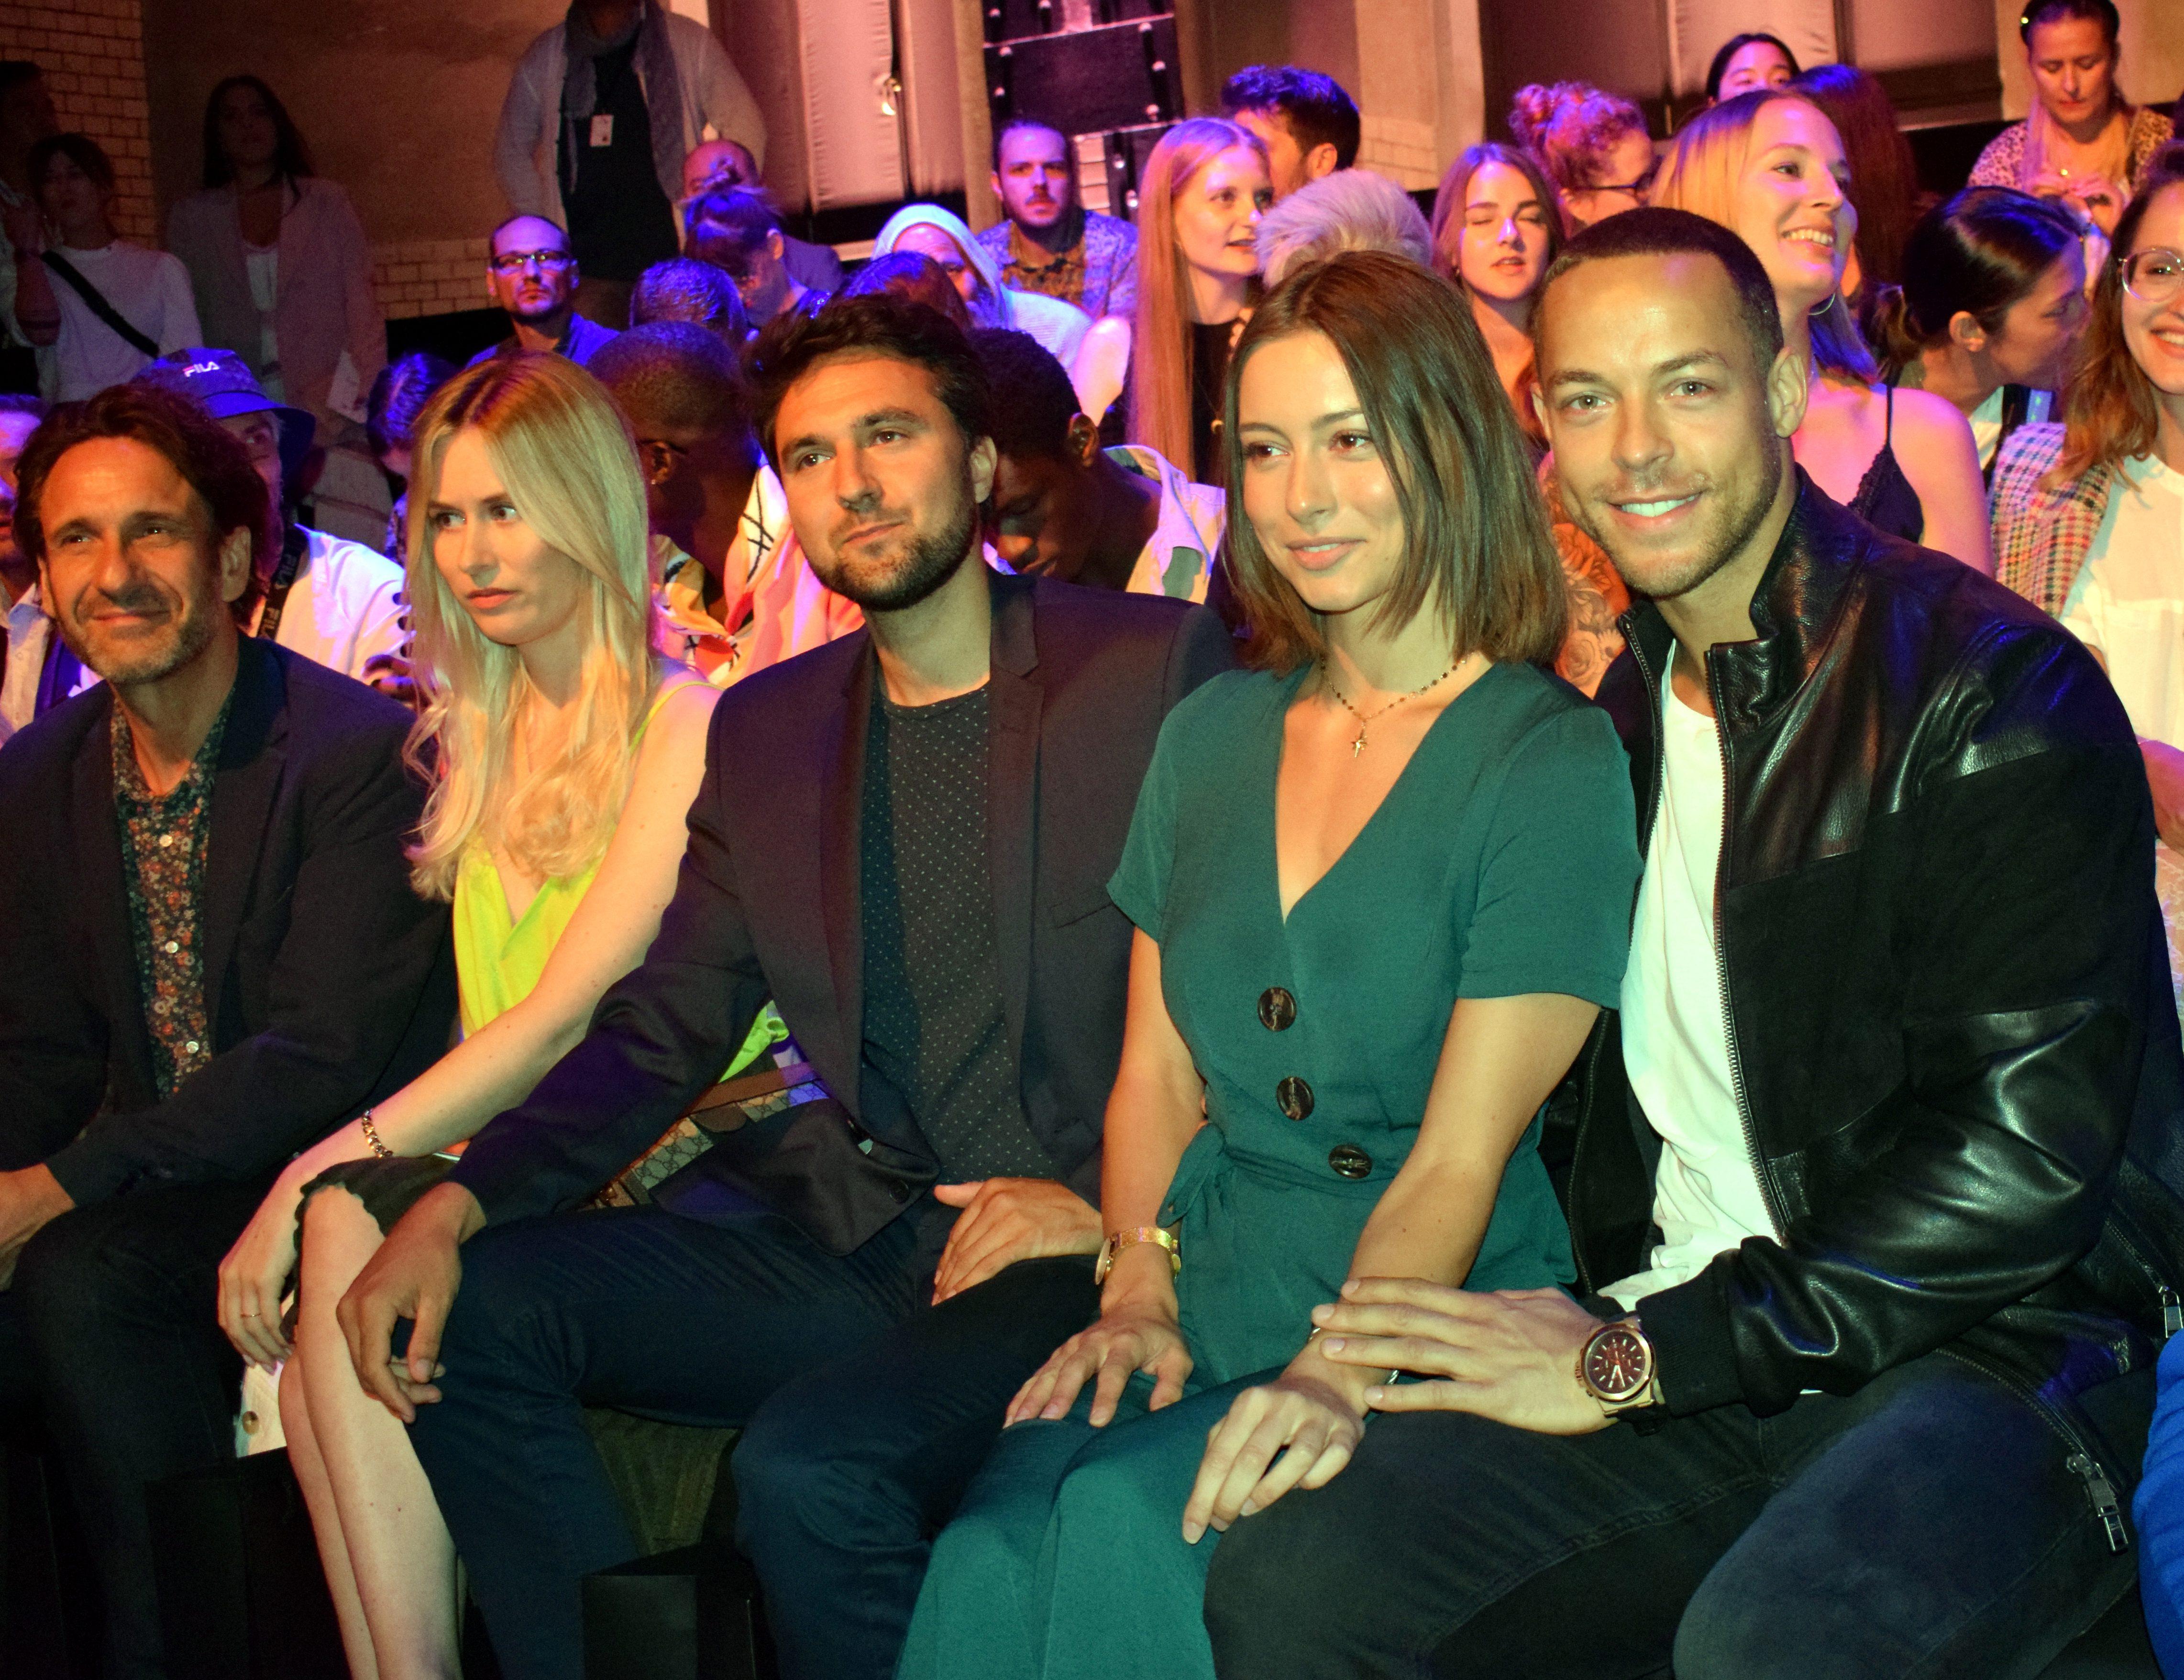 Berlin Fashion Week 2019, Catwalk, Mode, Bachelor Andrej Mangold, Jennifer Lange, Show Irene Luft, Promi